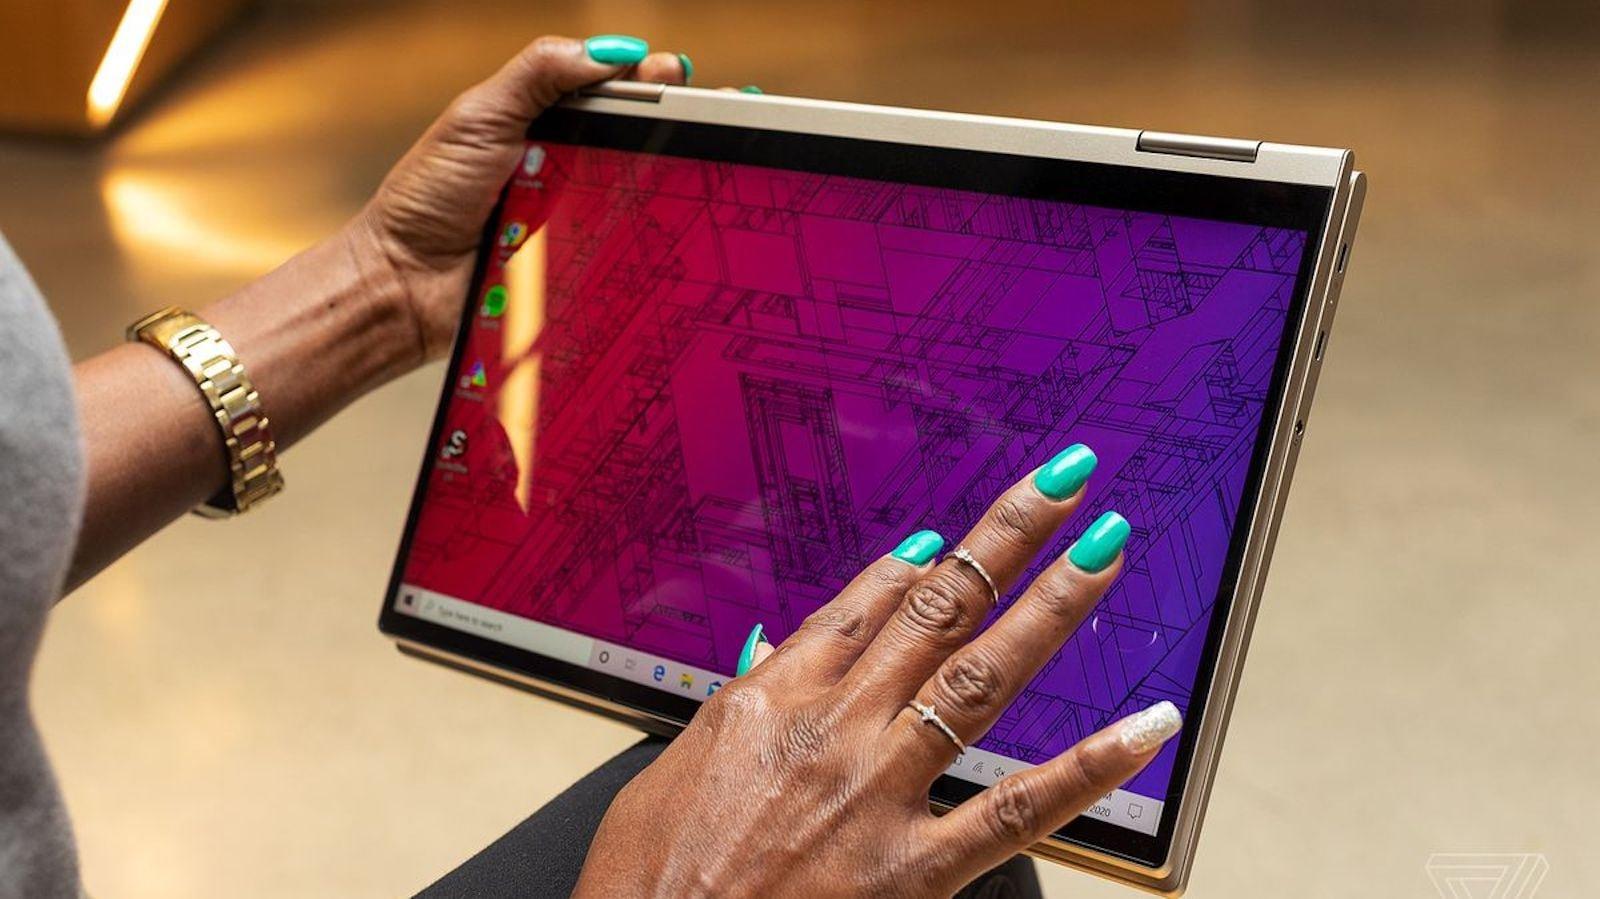 Lenovo Yoga C740 Responsive Touchscreen Laptop looks sleek at an affordable price